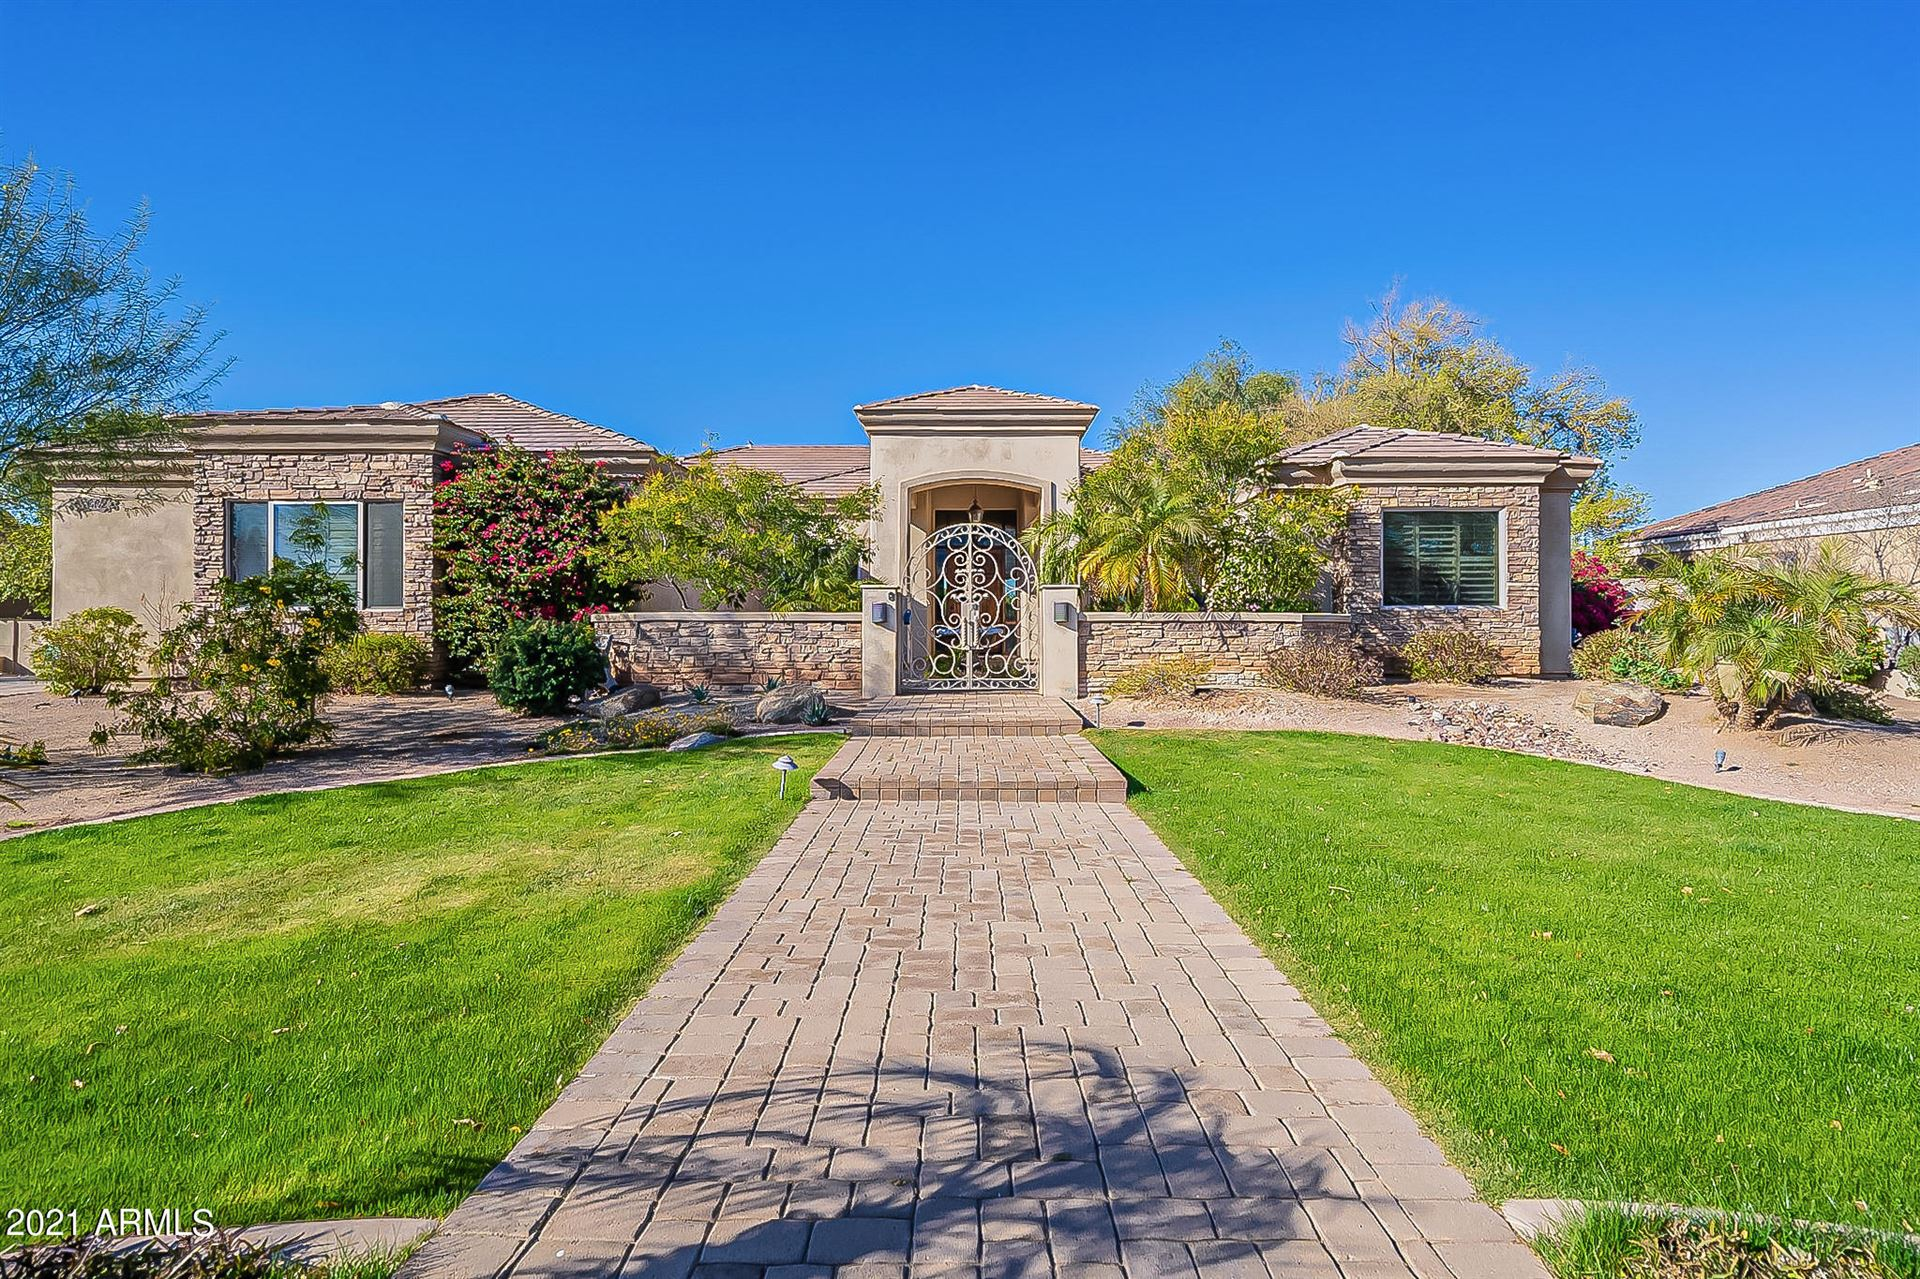 Photo of 3662 E SUNNYDALE Drive, Queen Creek, AZ 85142 (MLS # 6202844)